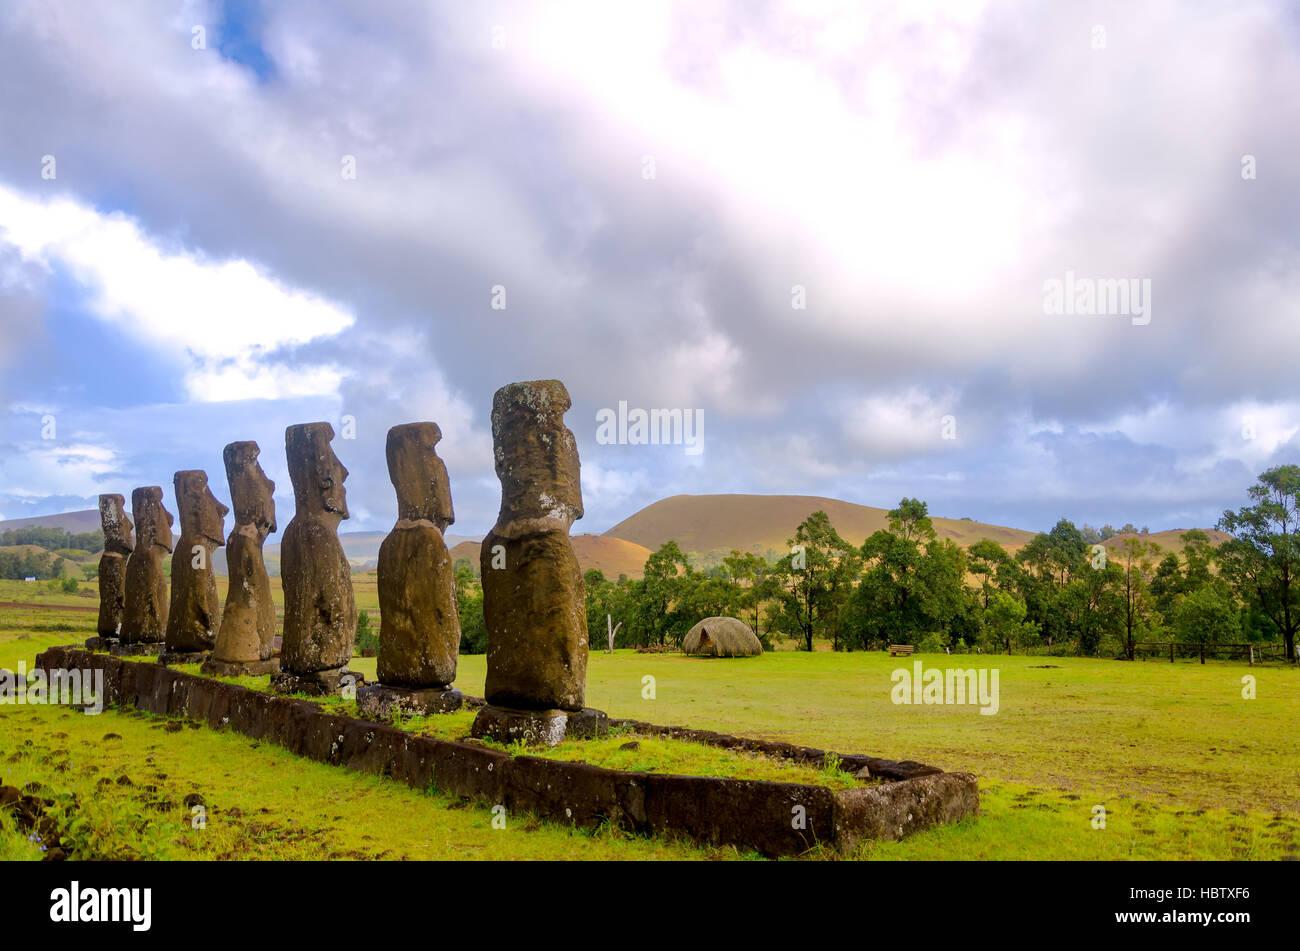 Hermosas estatuas moai con vistas a la Isla de Pascua, Chile Imagen De Stock